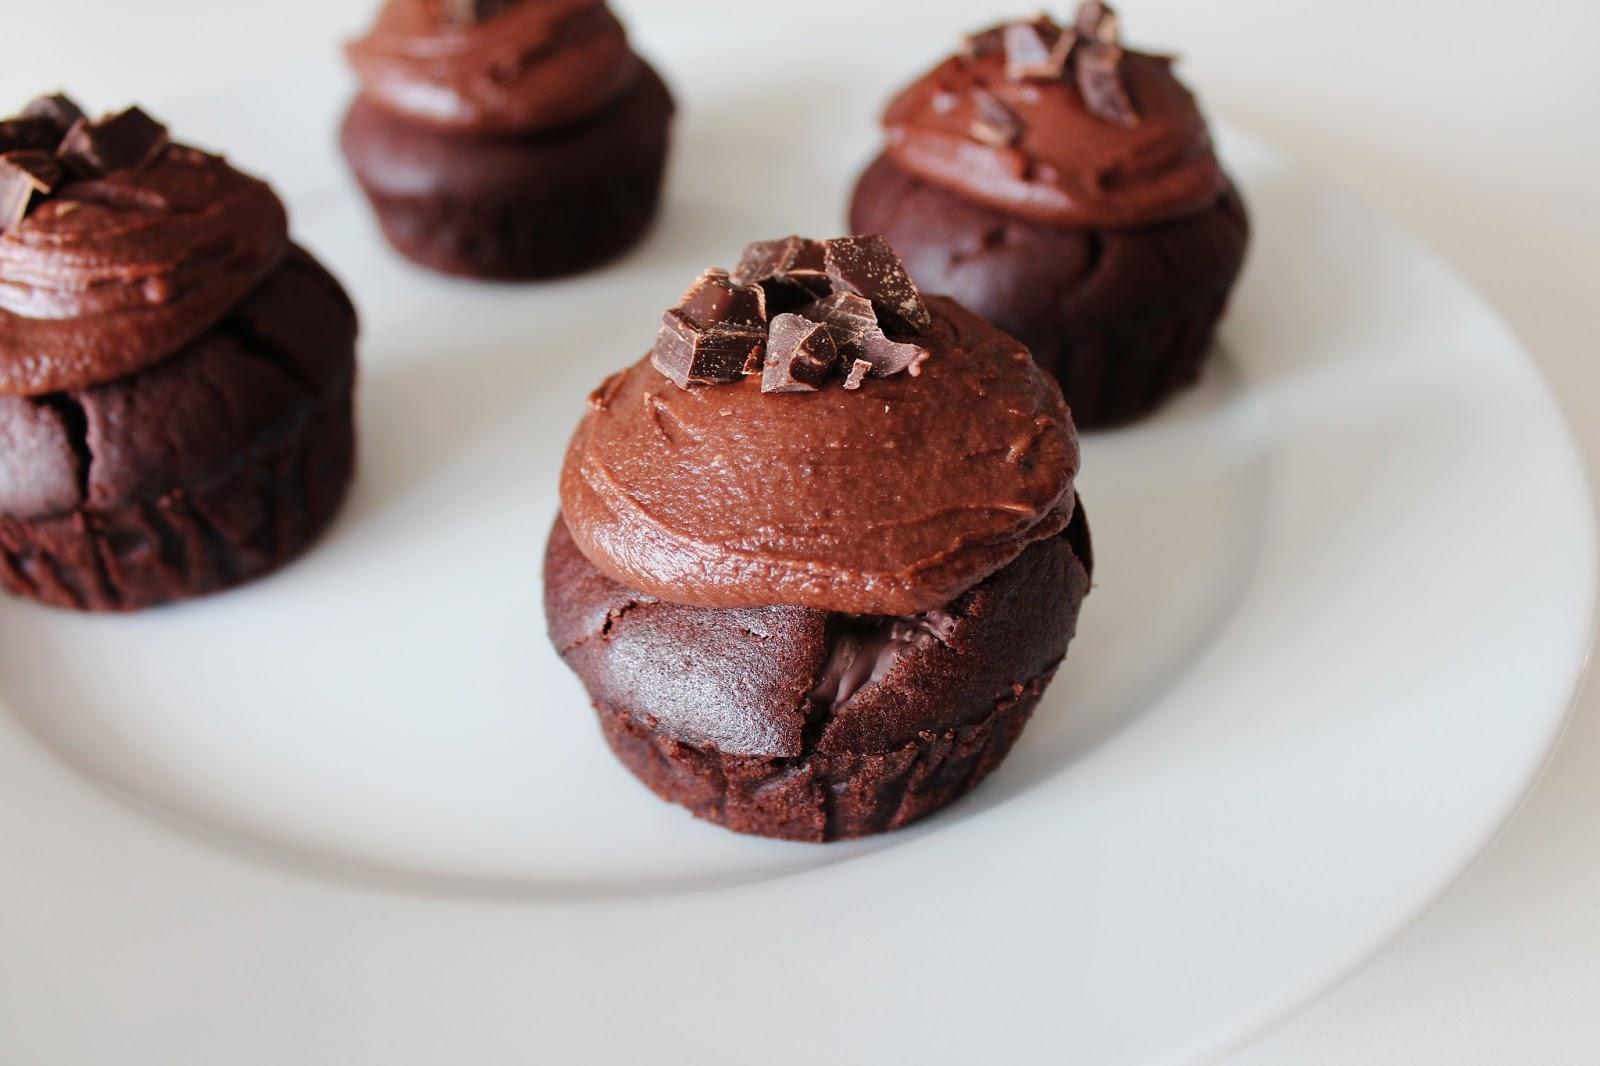 Chokolade Muffins med Smørcreme – Svampede Chokolade Muffins